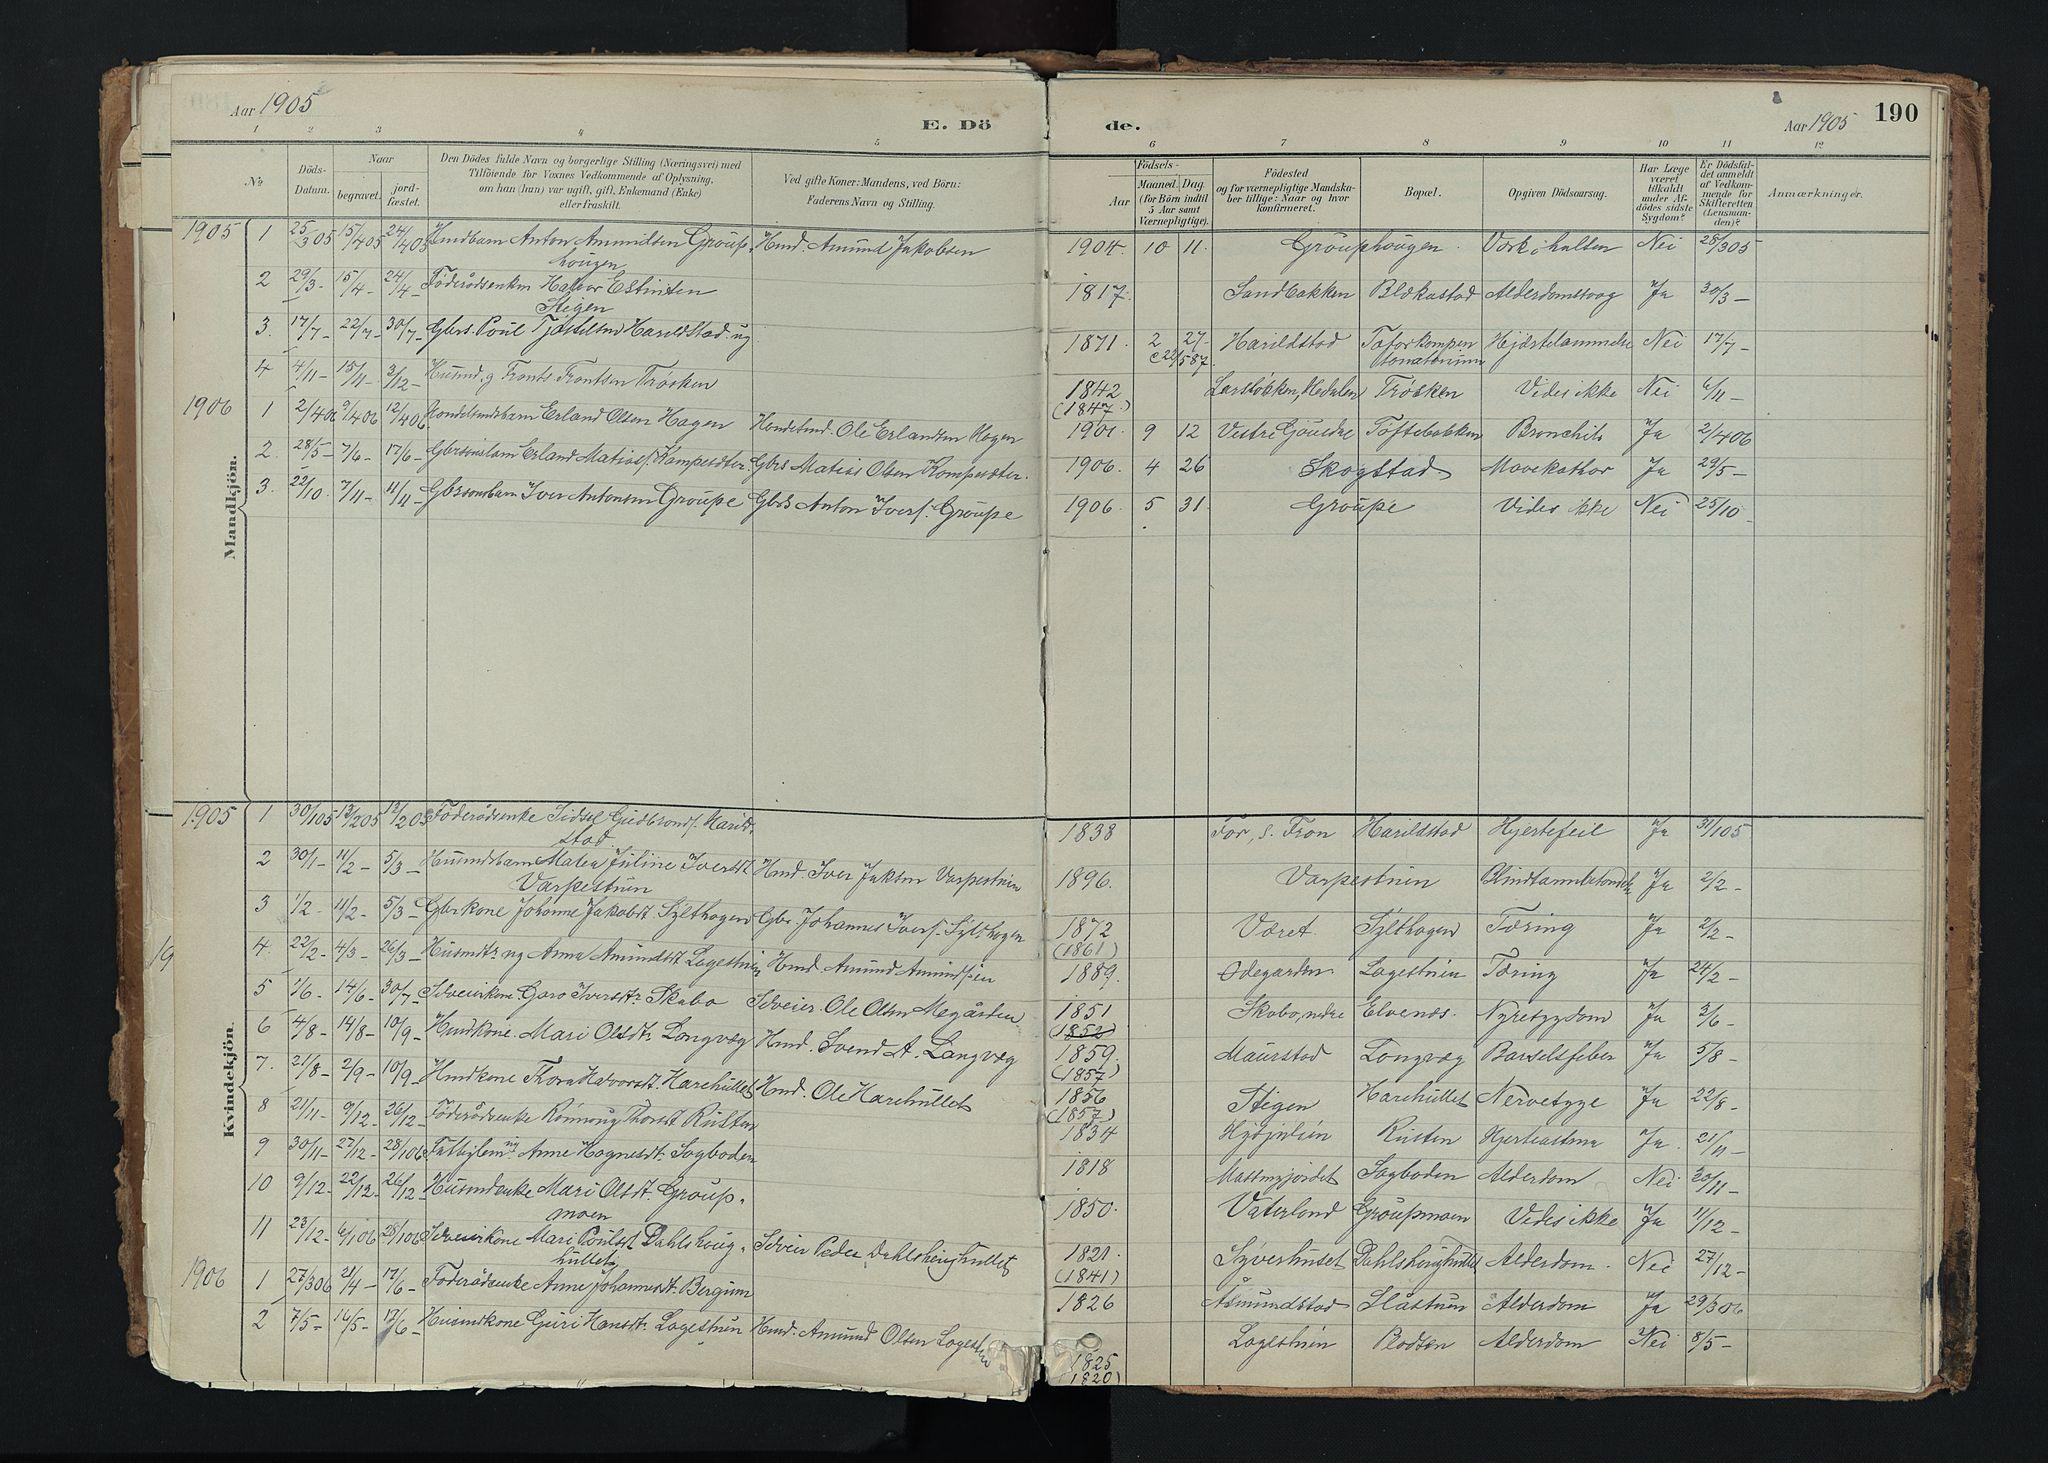 SAH, Nord-Fron prestekontor, Ministerialbok nr. 5, 1884-1914, s. 190